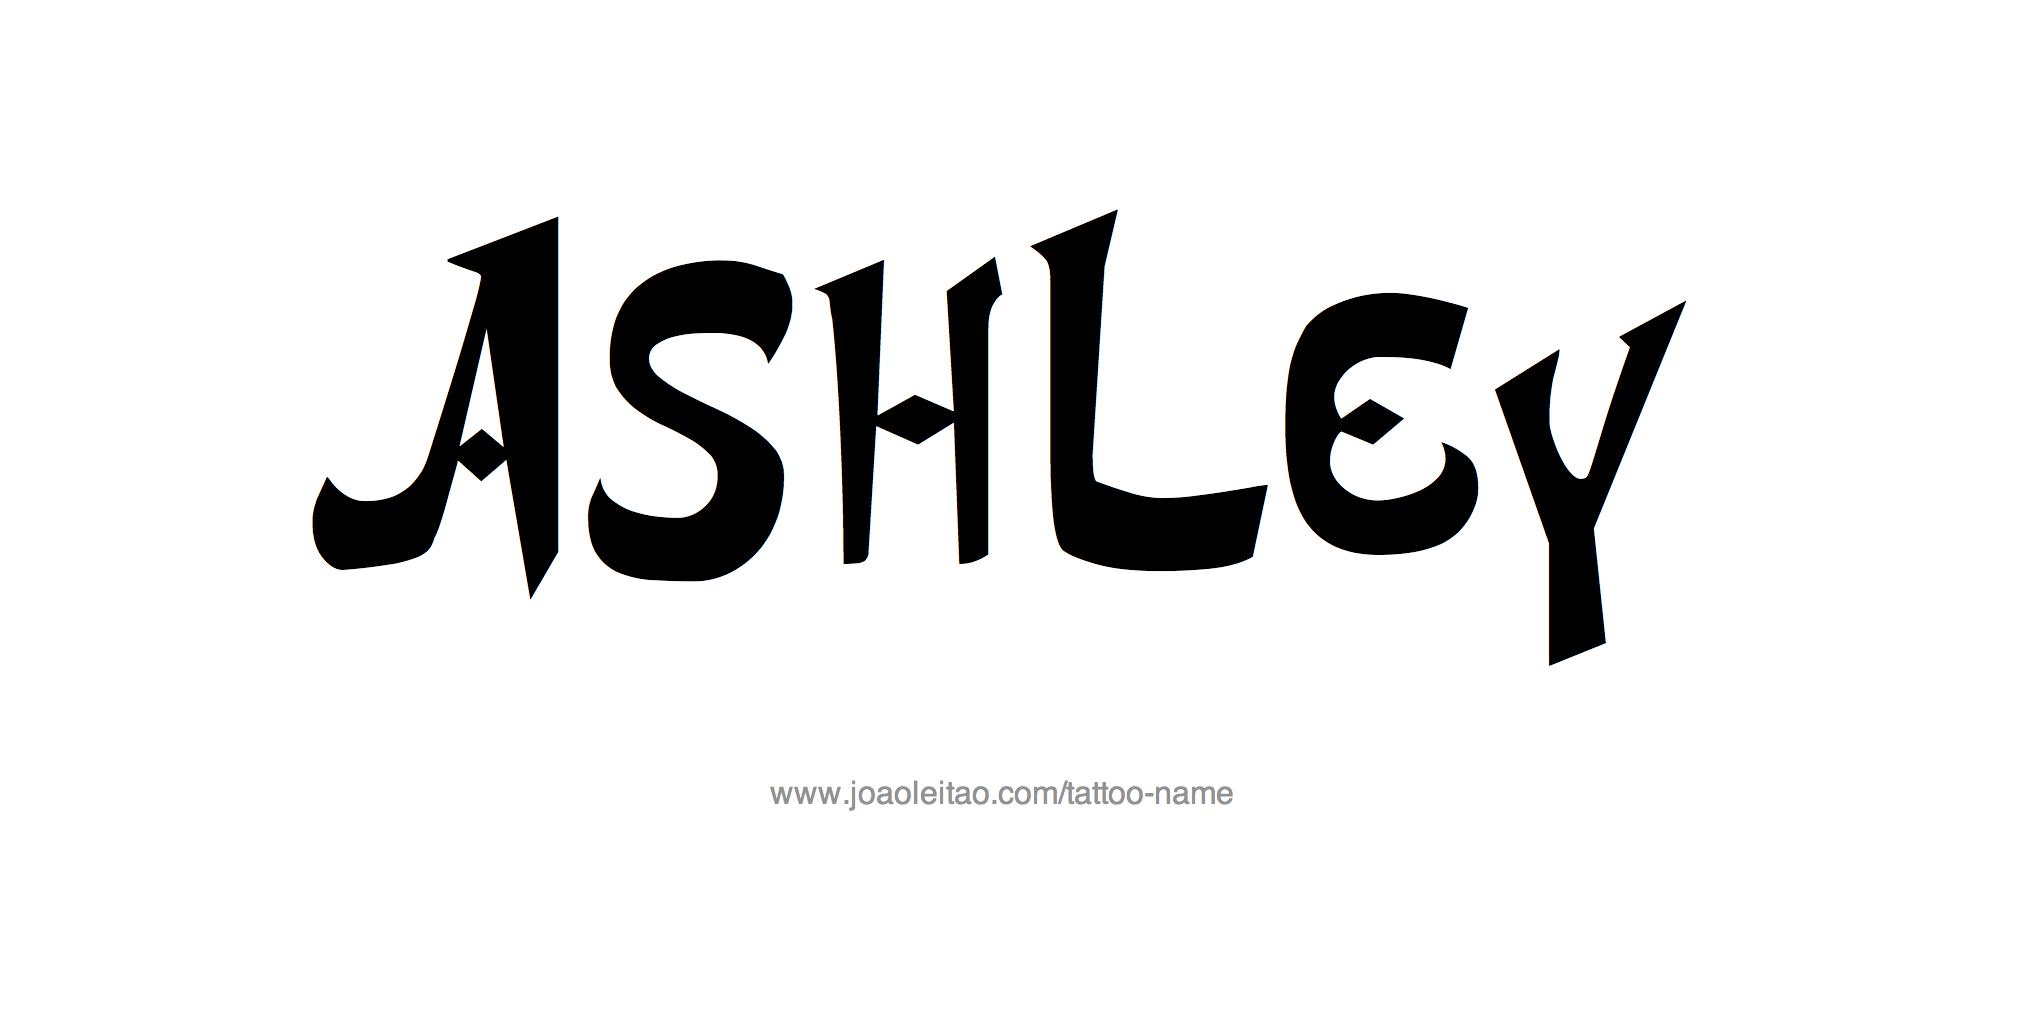 Name: Ashley Name Tattoo Designs